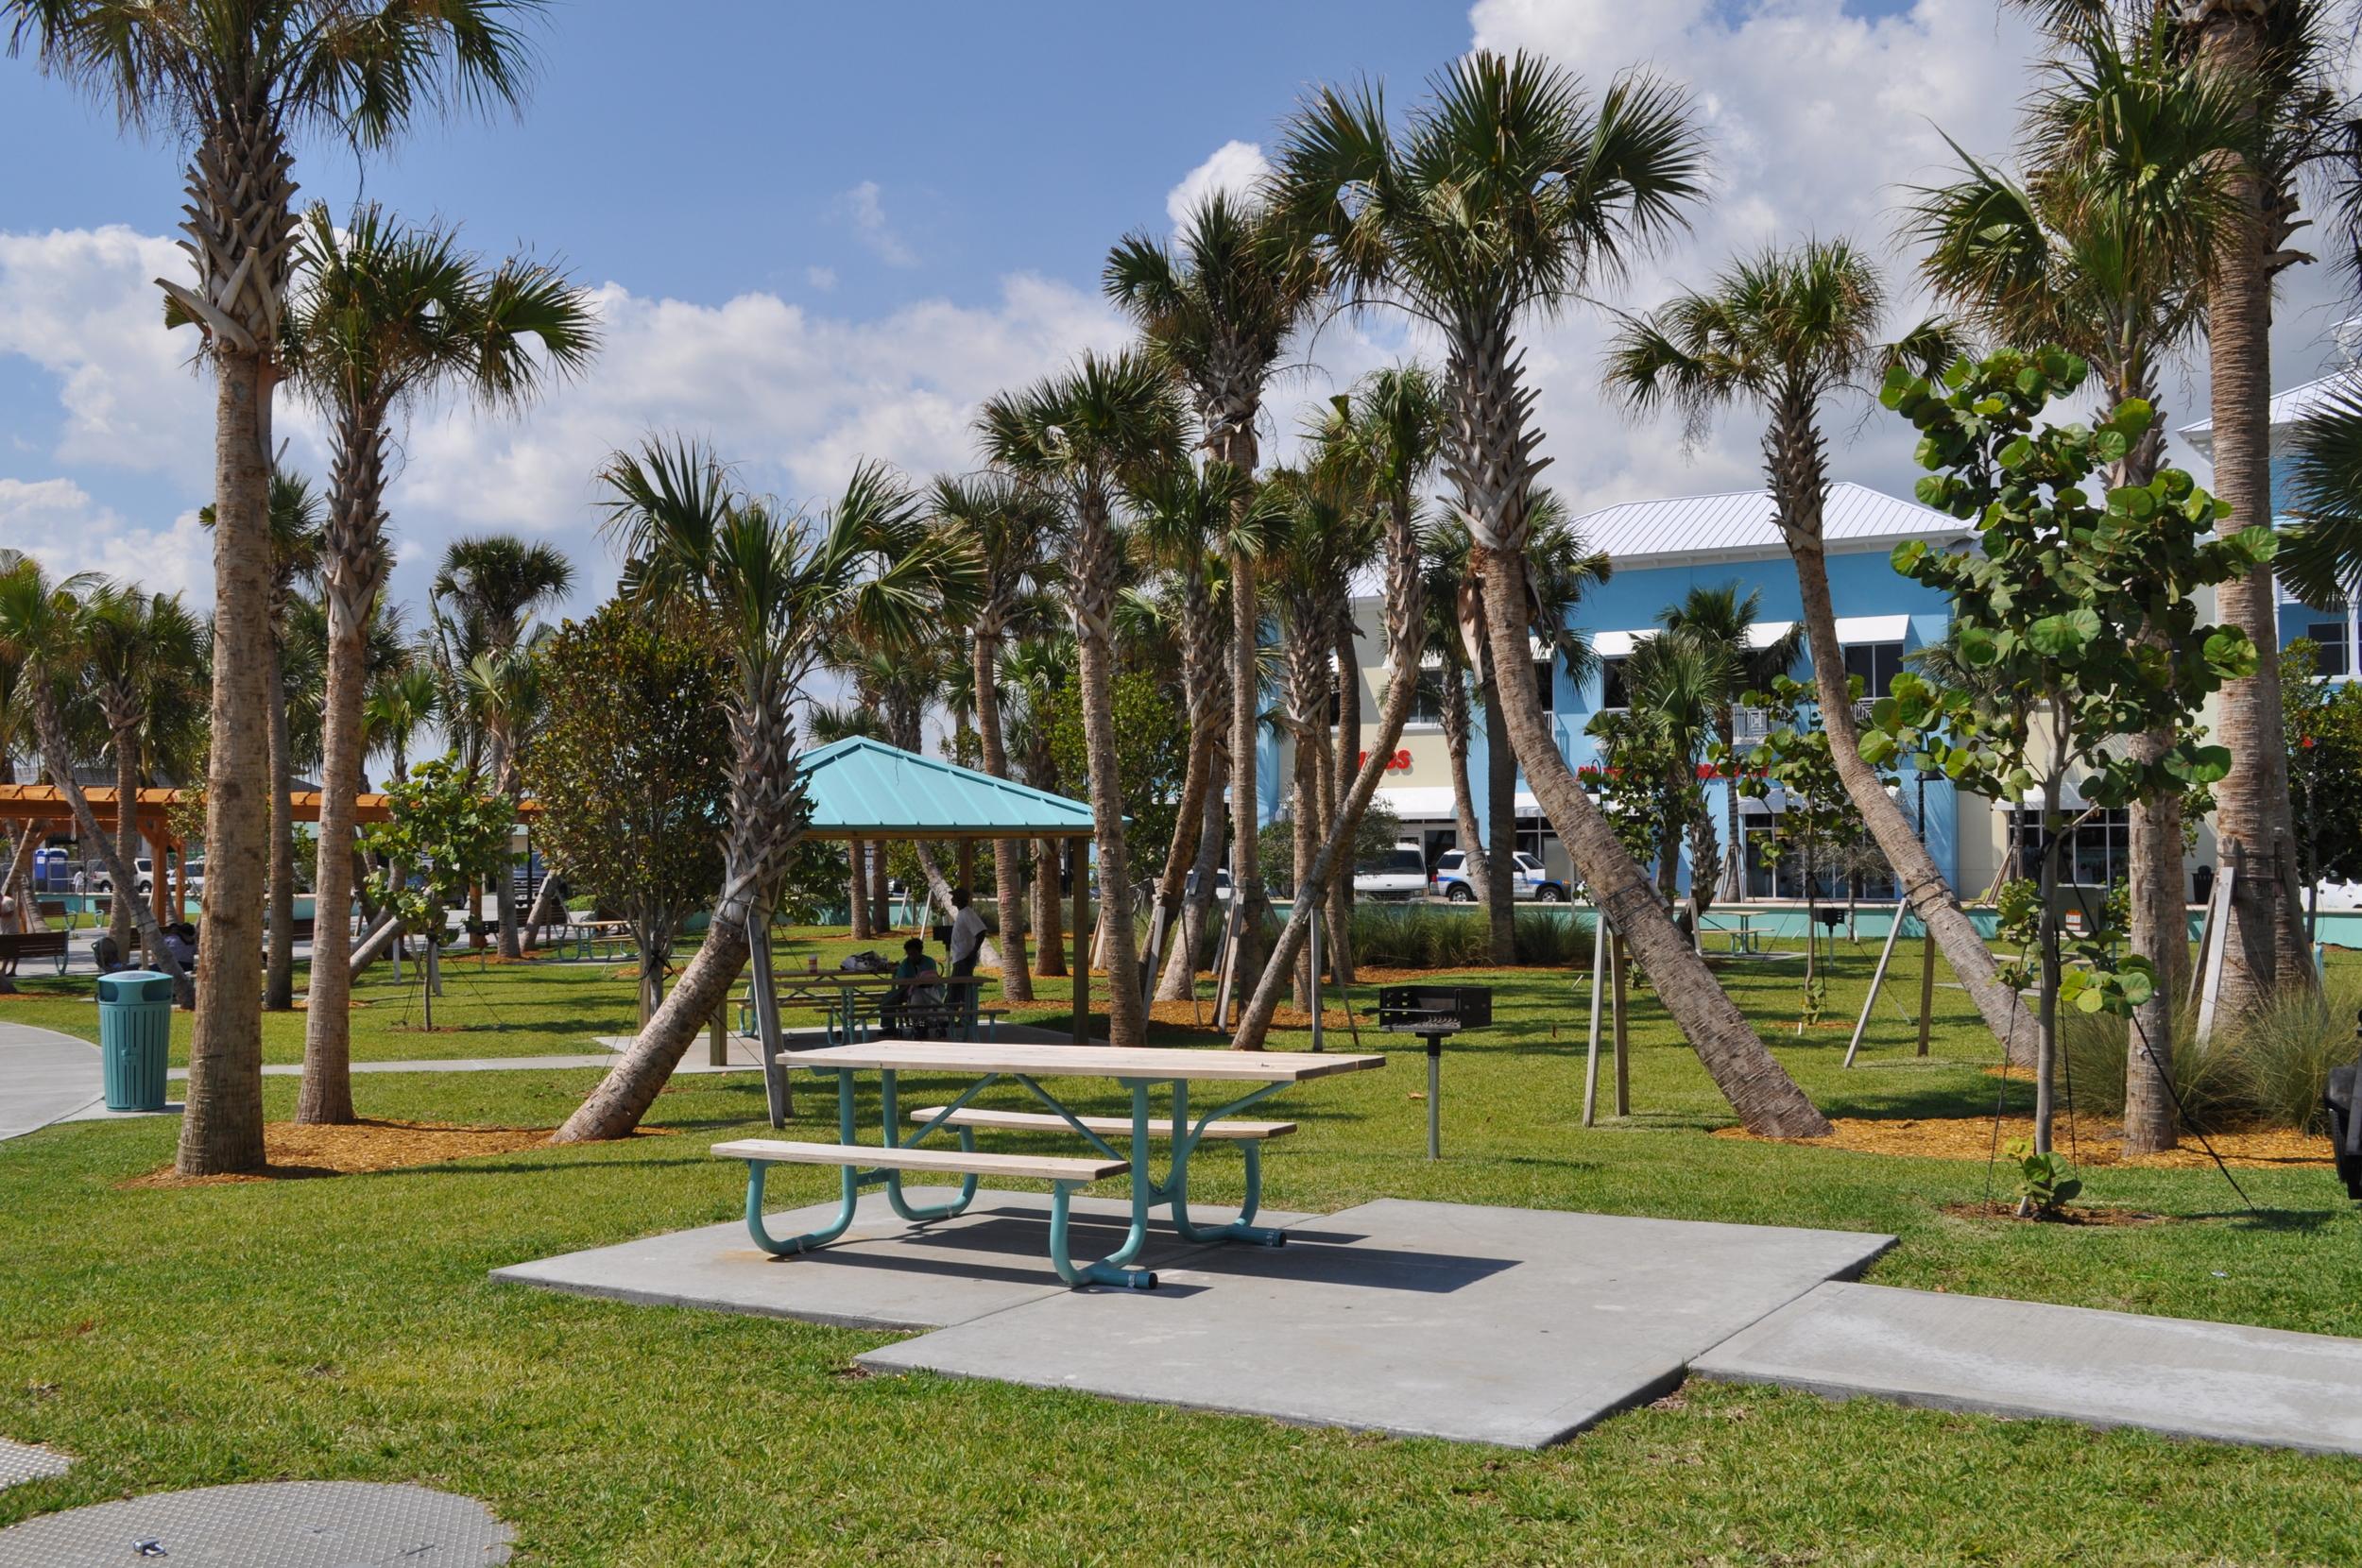 City of Riviera Beach Municipal Beach Park Ocean Mall Full Sun ADA Picnic Table.jpg